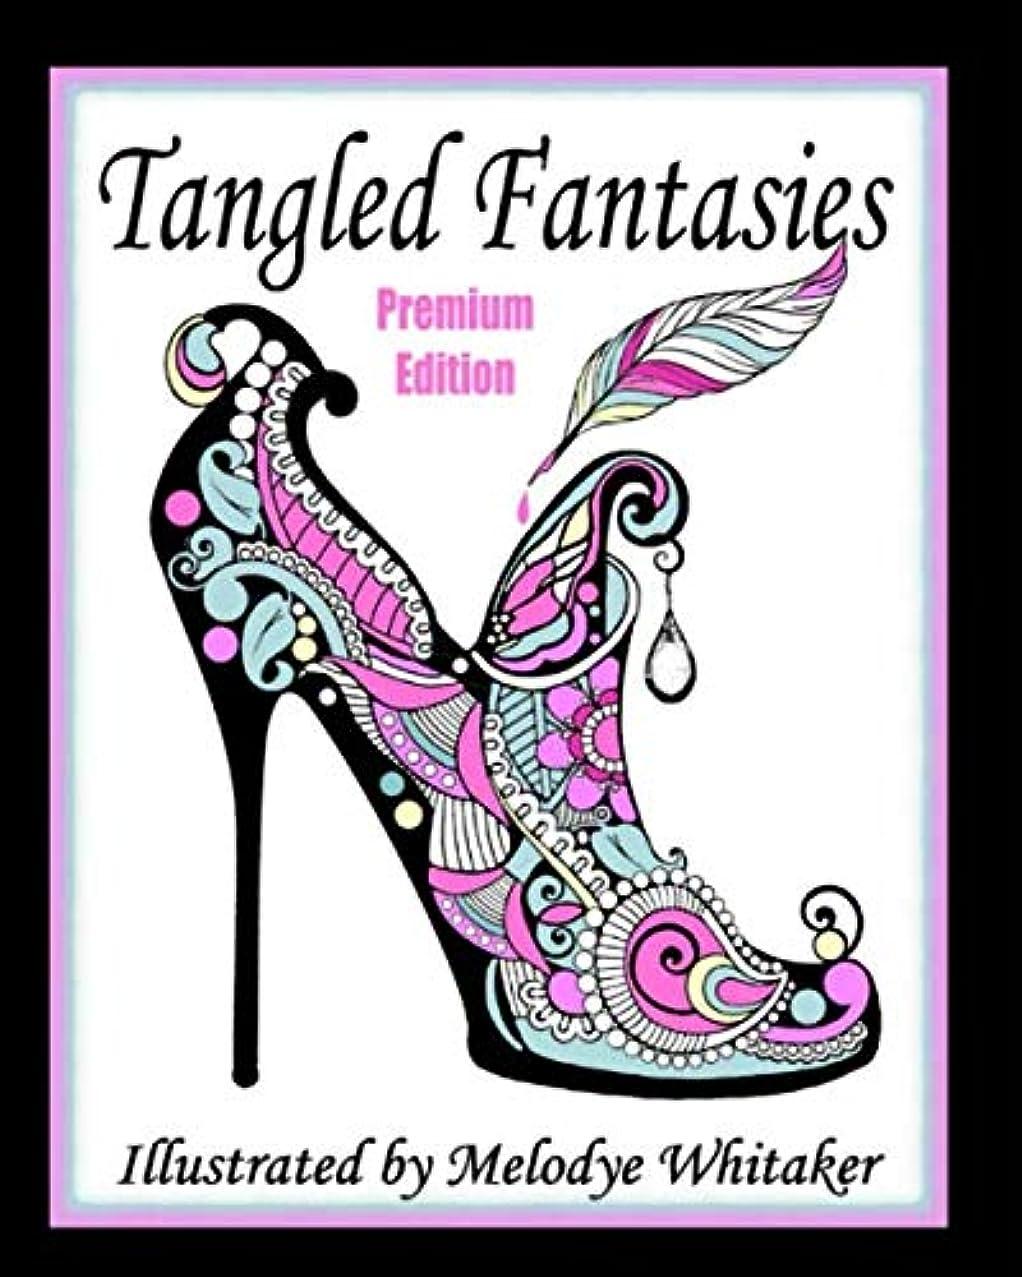 Tangled Fantasies: Premium Edition